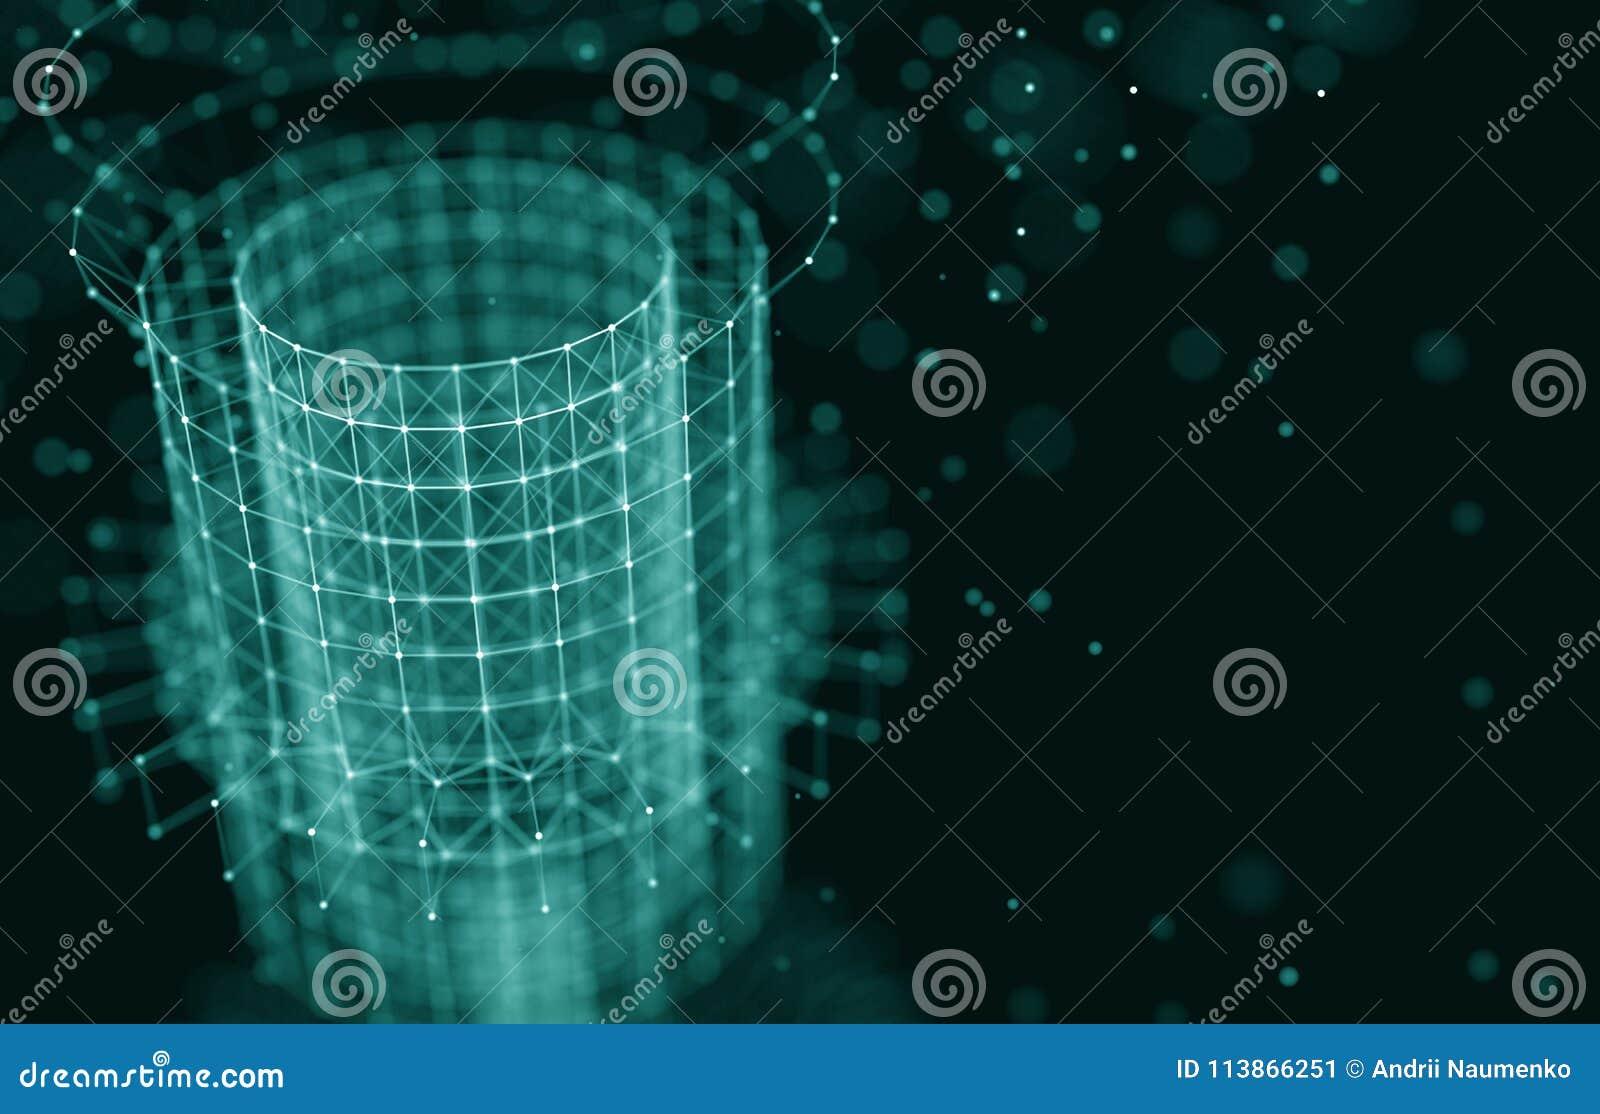 Futuristische Achtergrond 3d geef illustratie terug Abstracte architectuur Ruimtebouw Donkere achtergrond sc.i-FI Punten en